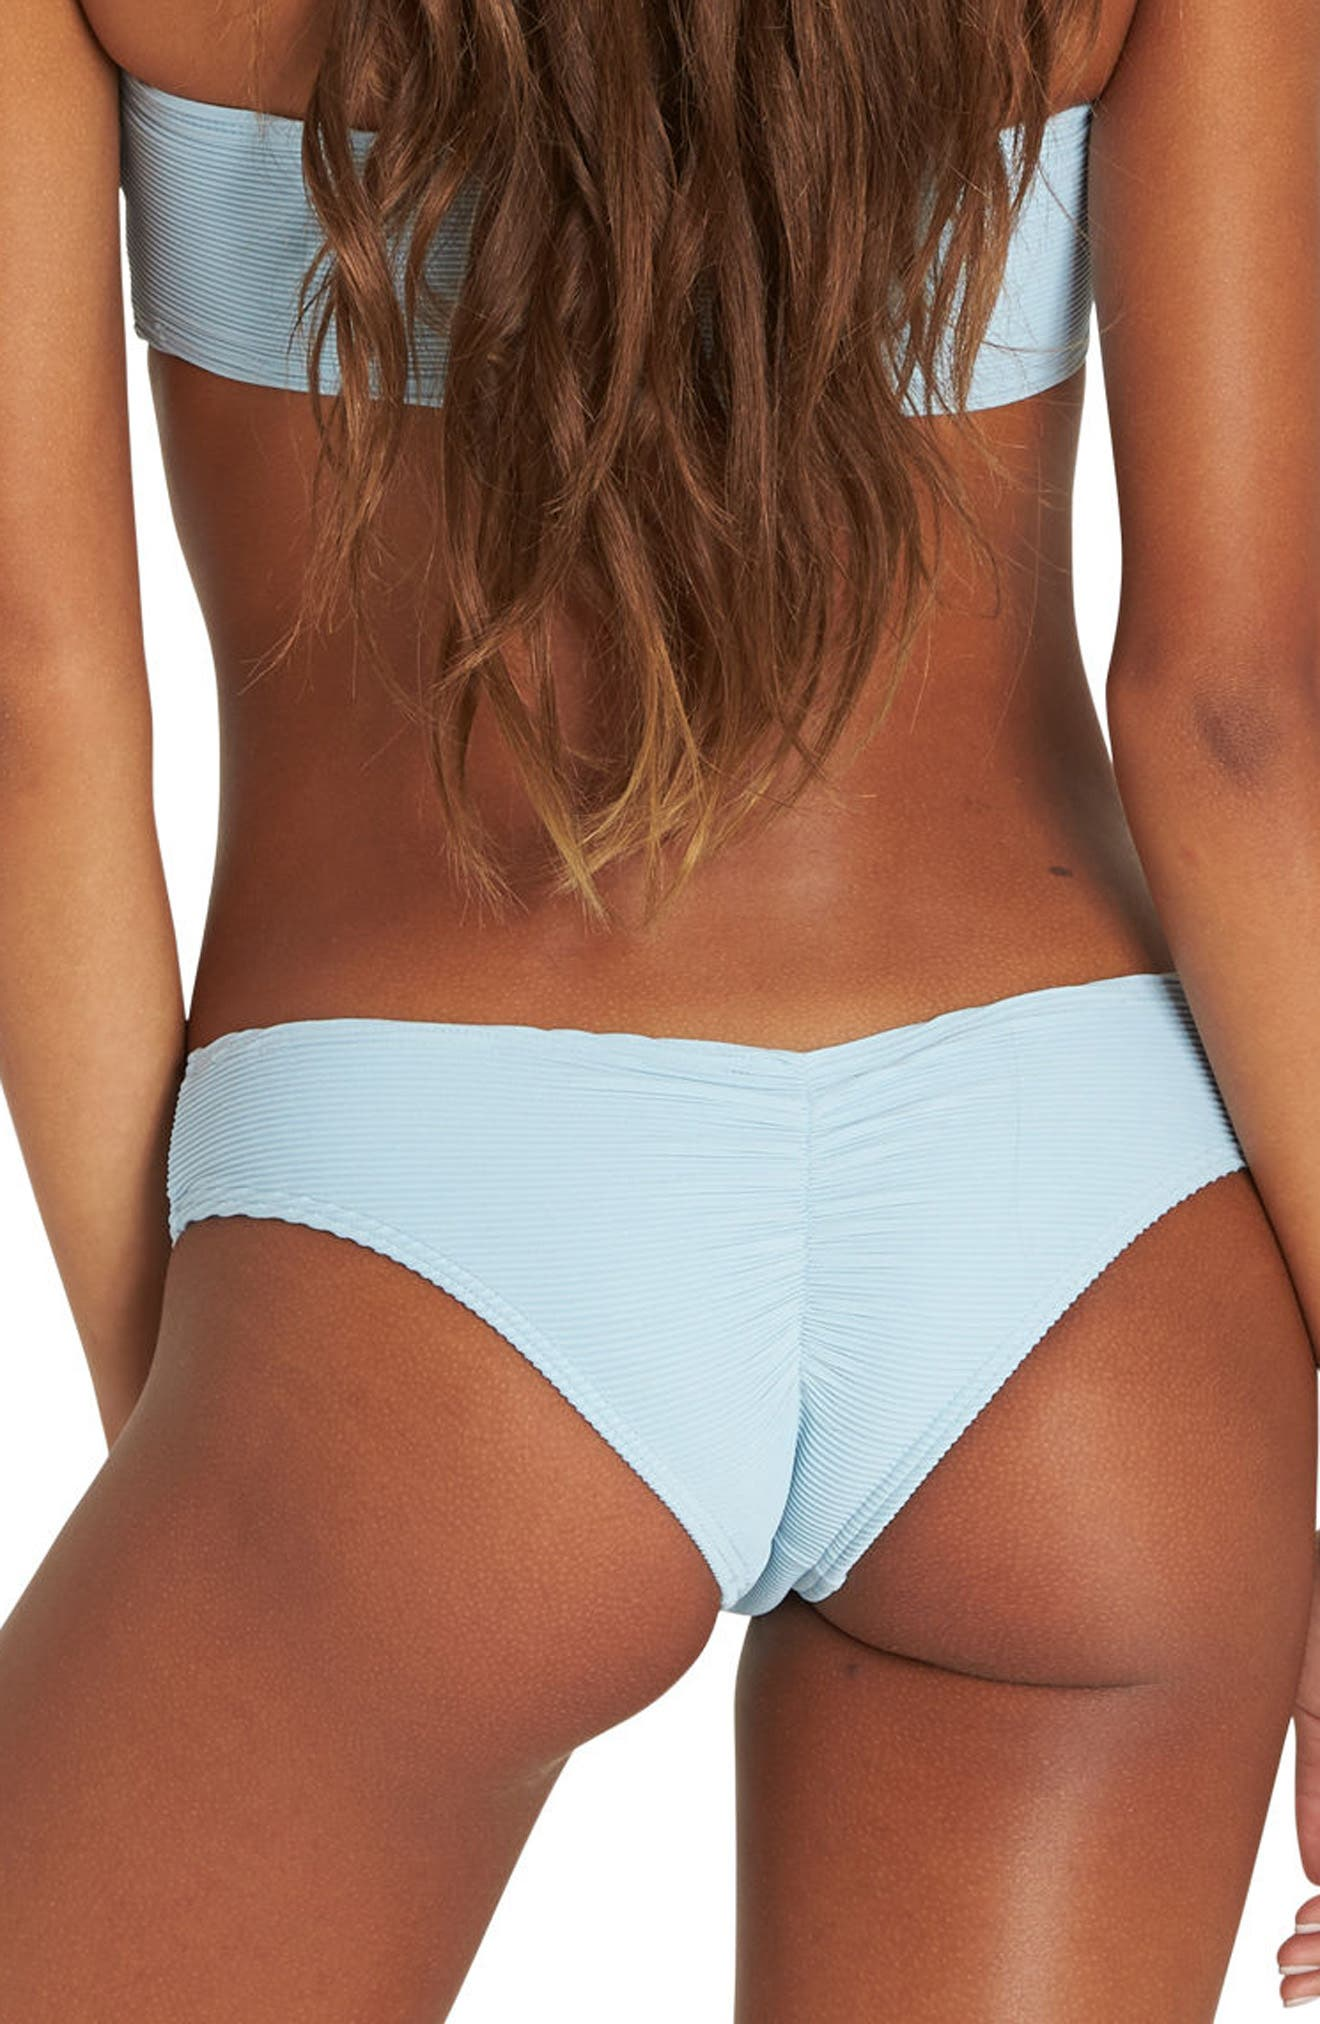 Tanlines Hawaii Bikini Bottoms,                             Alternate thumbnail 2, color,                             Cool Water